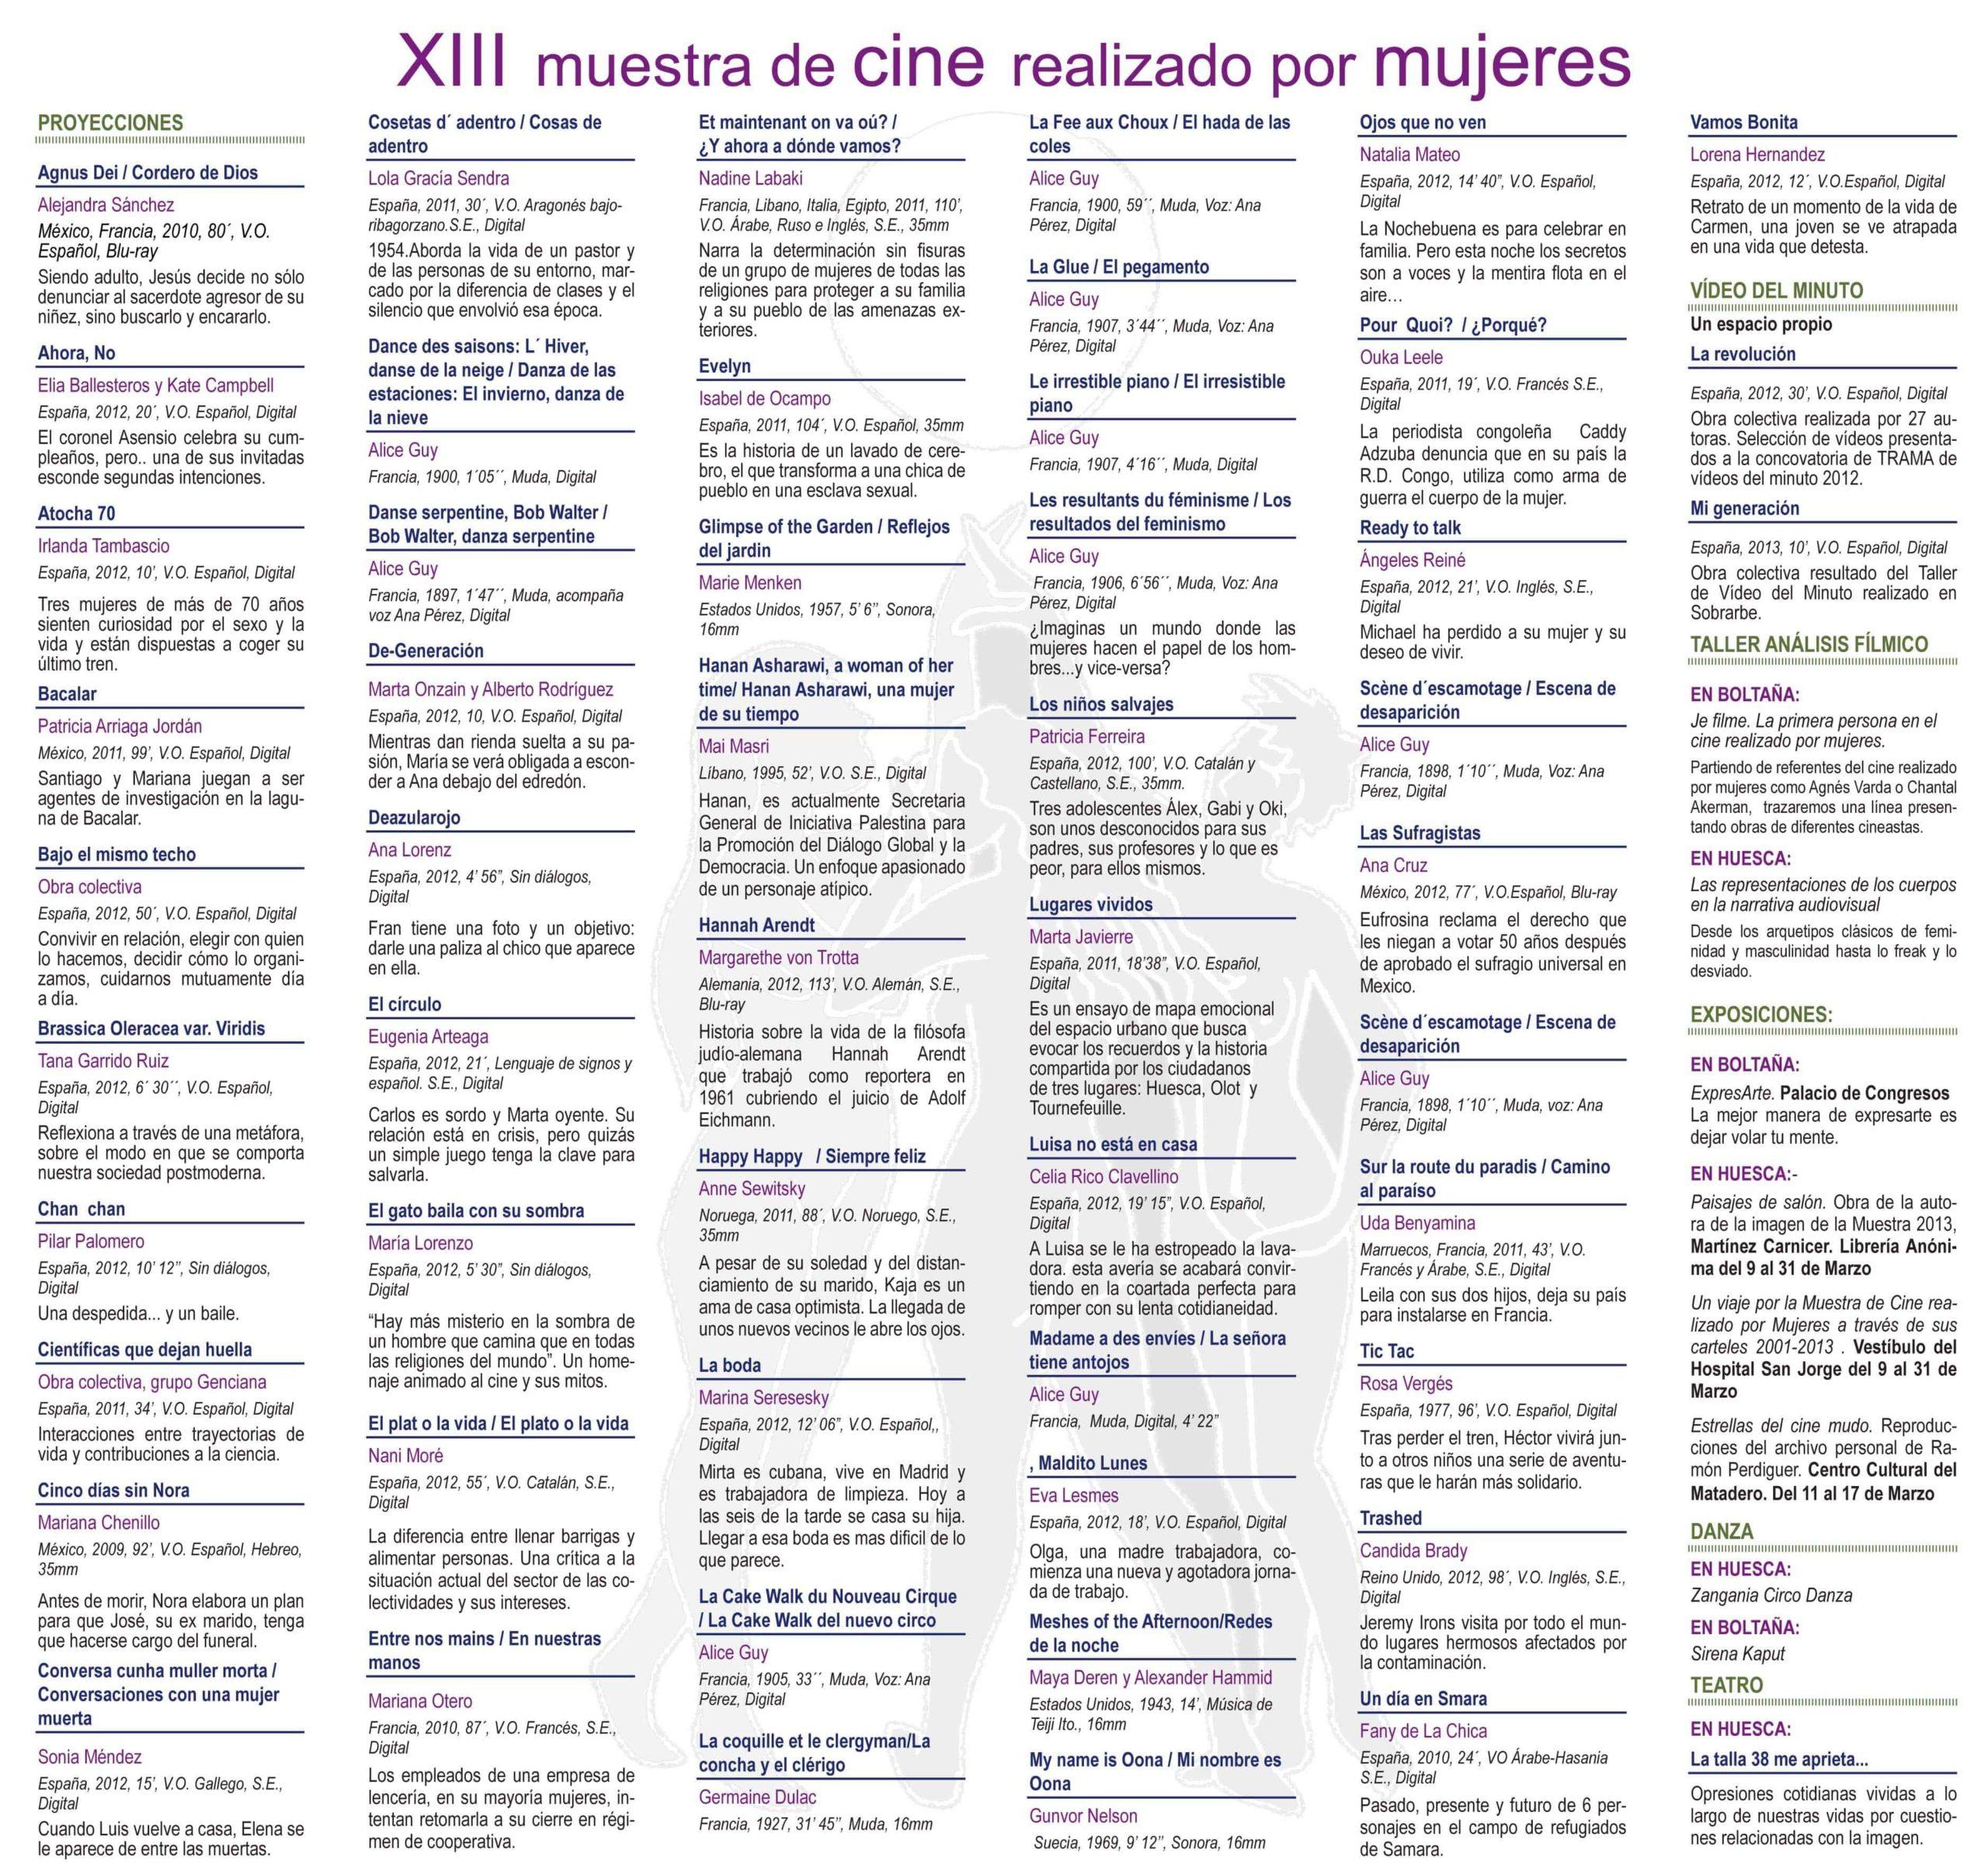 tripticoxiii_muestra_de_cine_mujeres_huesca2_copiar.jpg